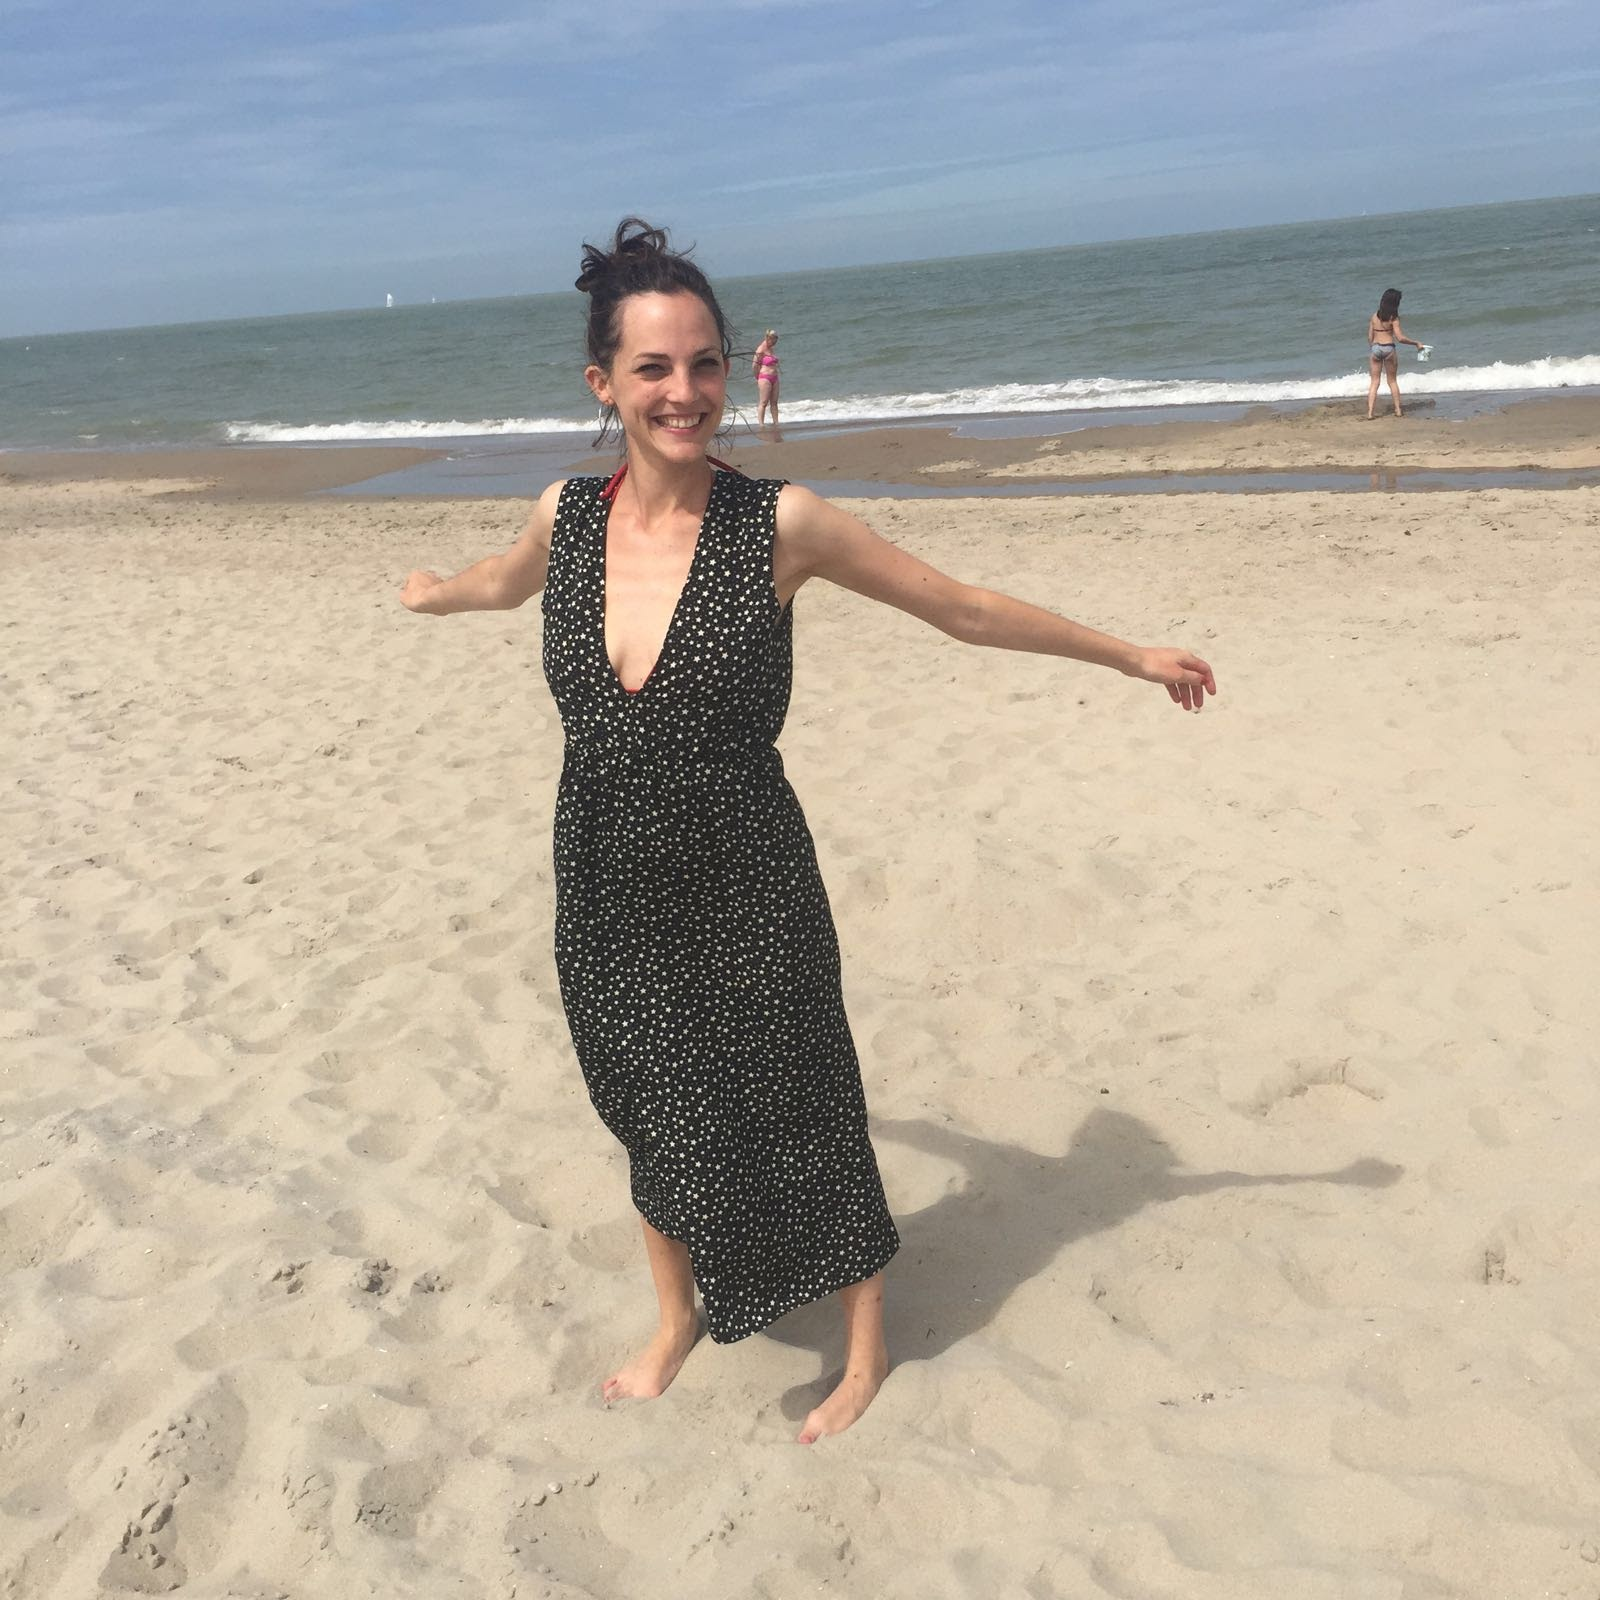 plage vestido largo asos verano.jpg